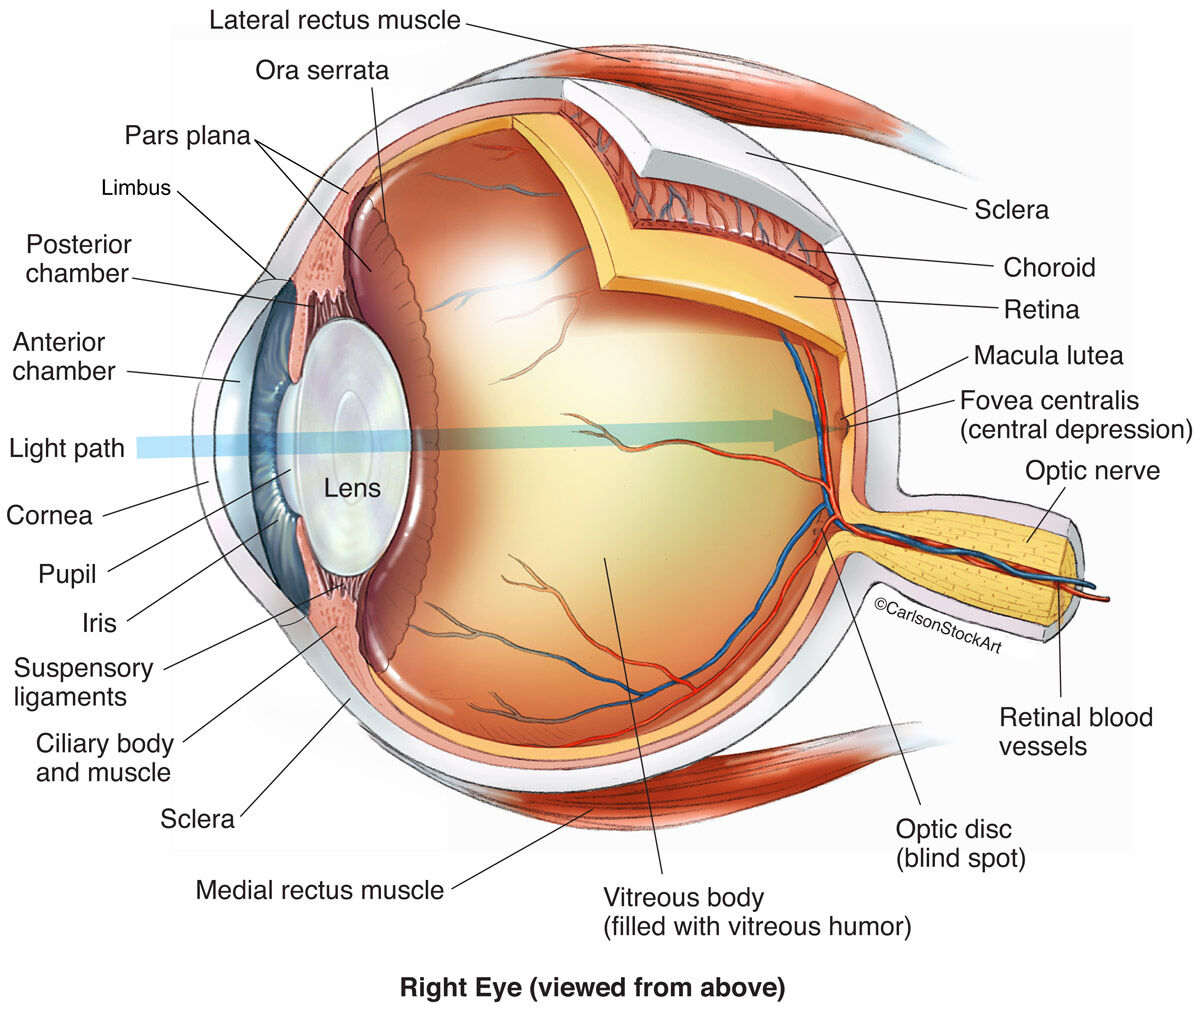 human eye diagram blind spot 1997 bmw z3 radio wiring anatomy 1 illustration carlson stock art